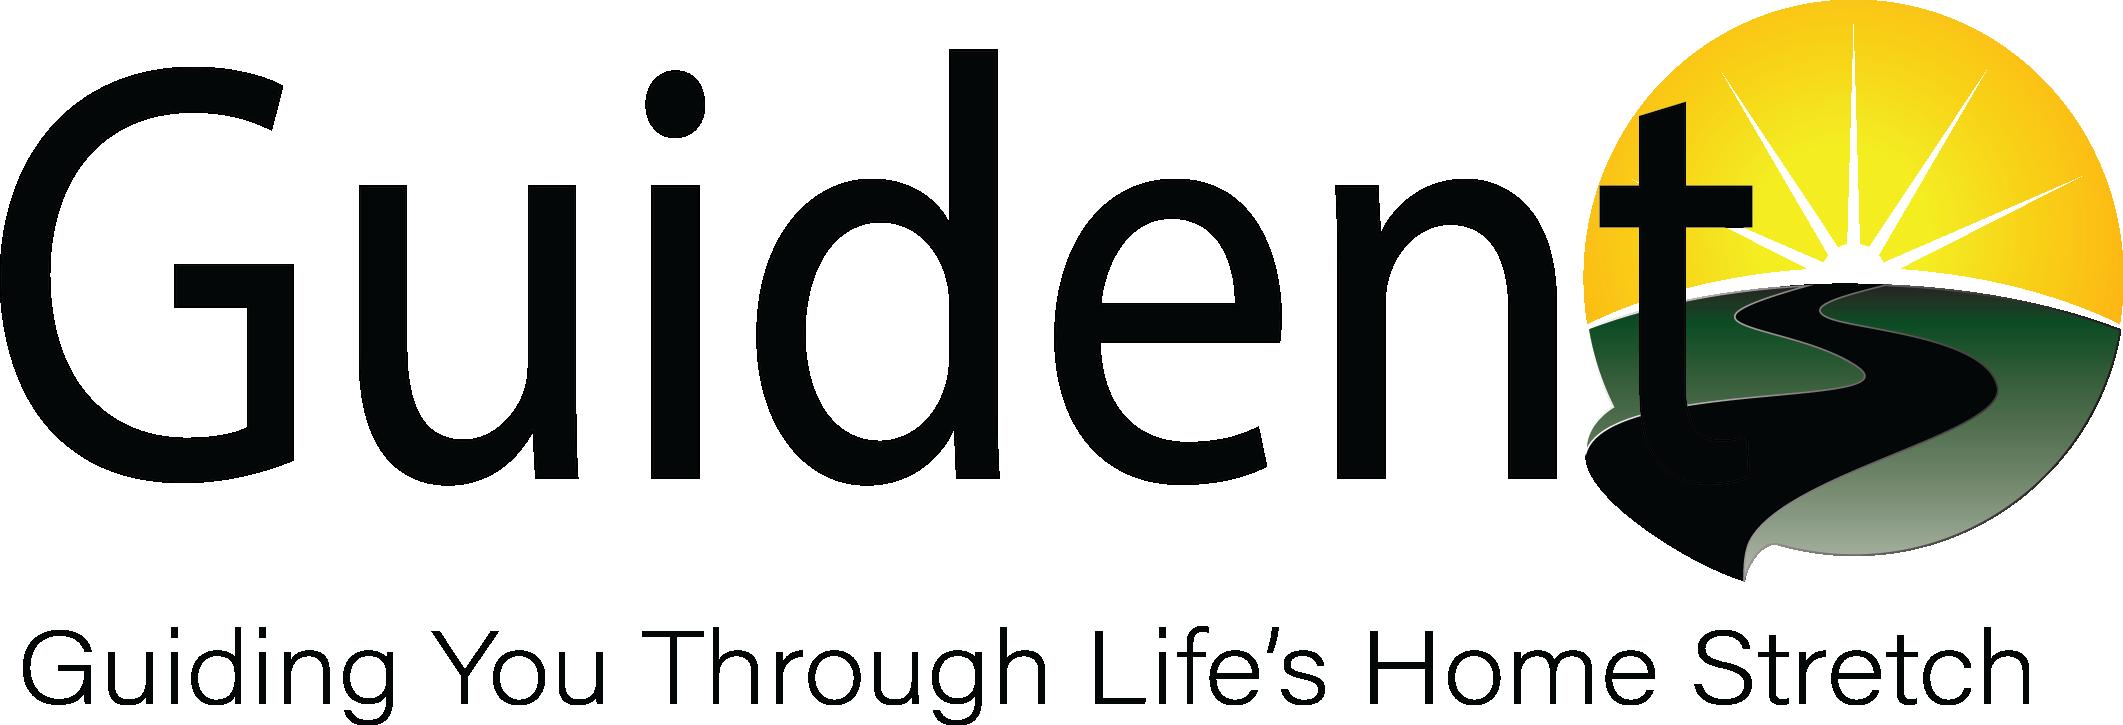 Guidents for Seniors Official logo 2020